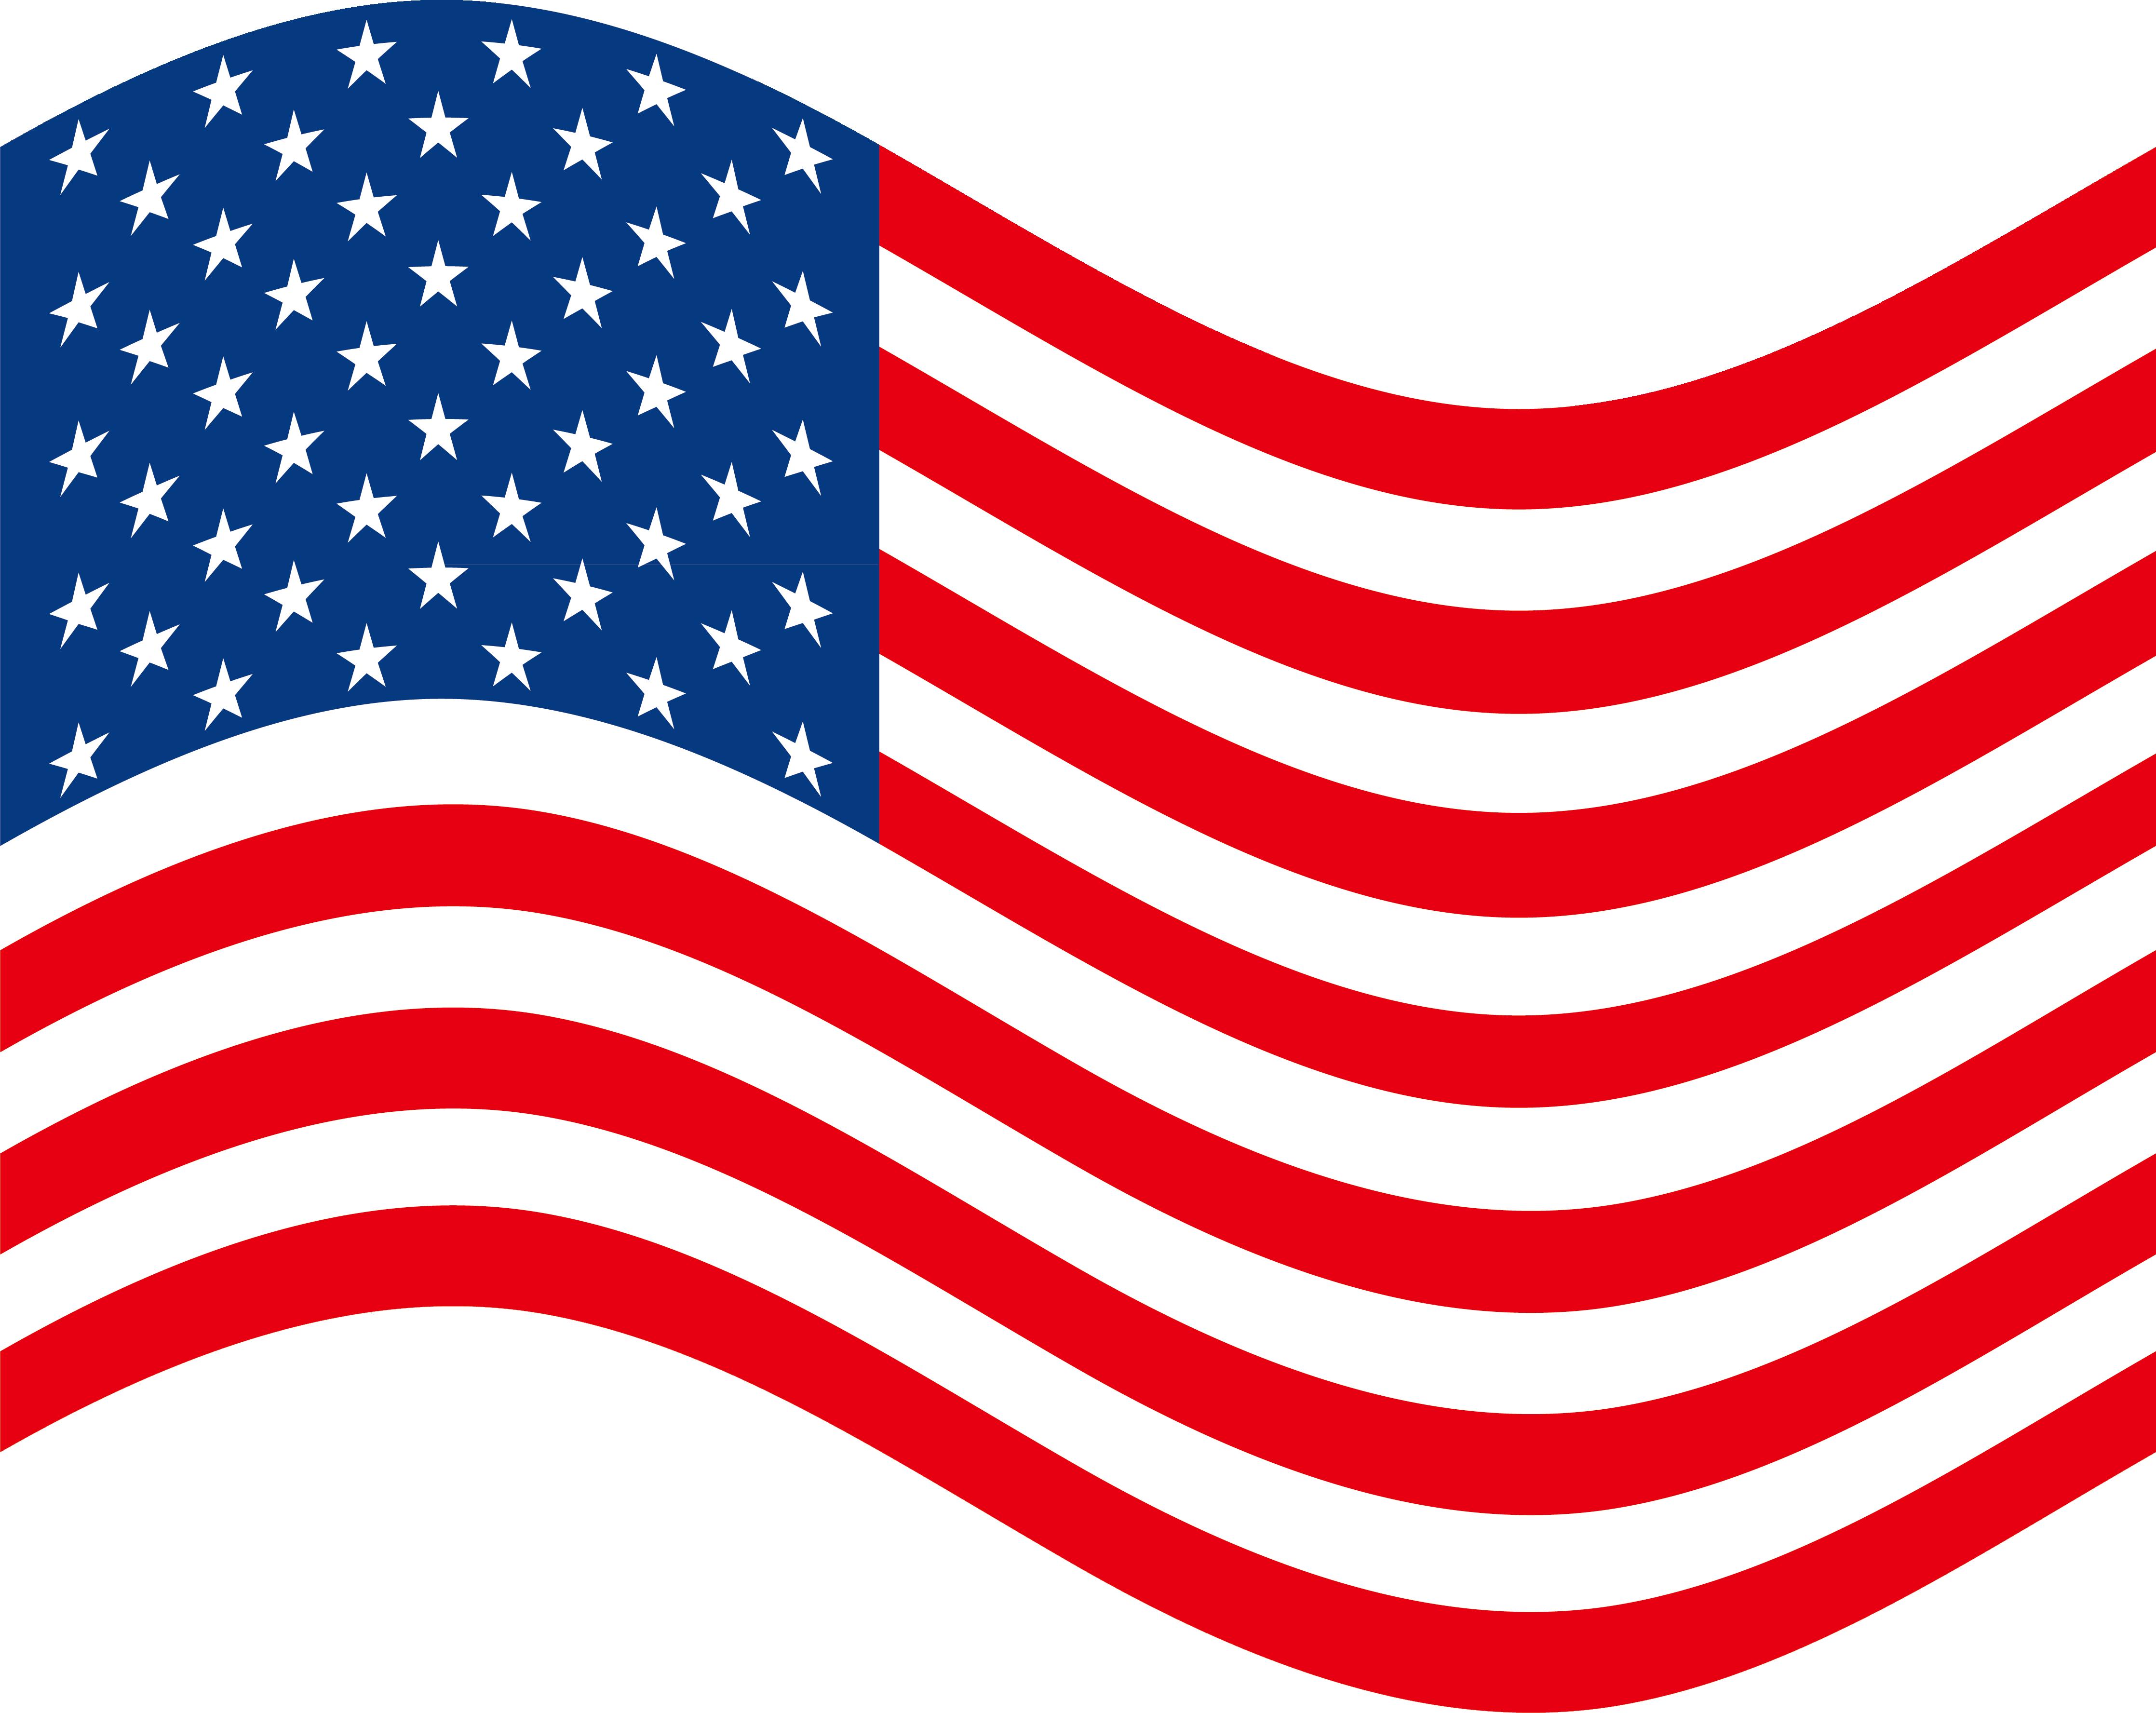 Usa clipart americanflag, Usa americanflag Transparent FREE.